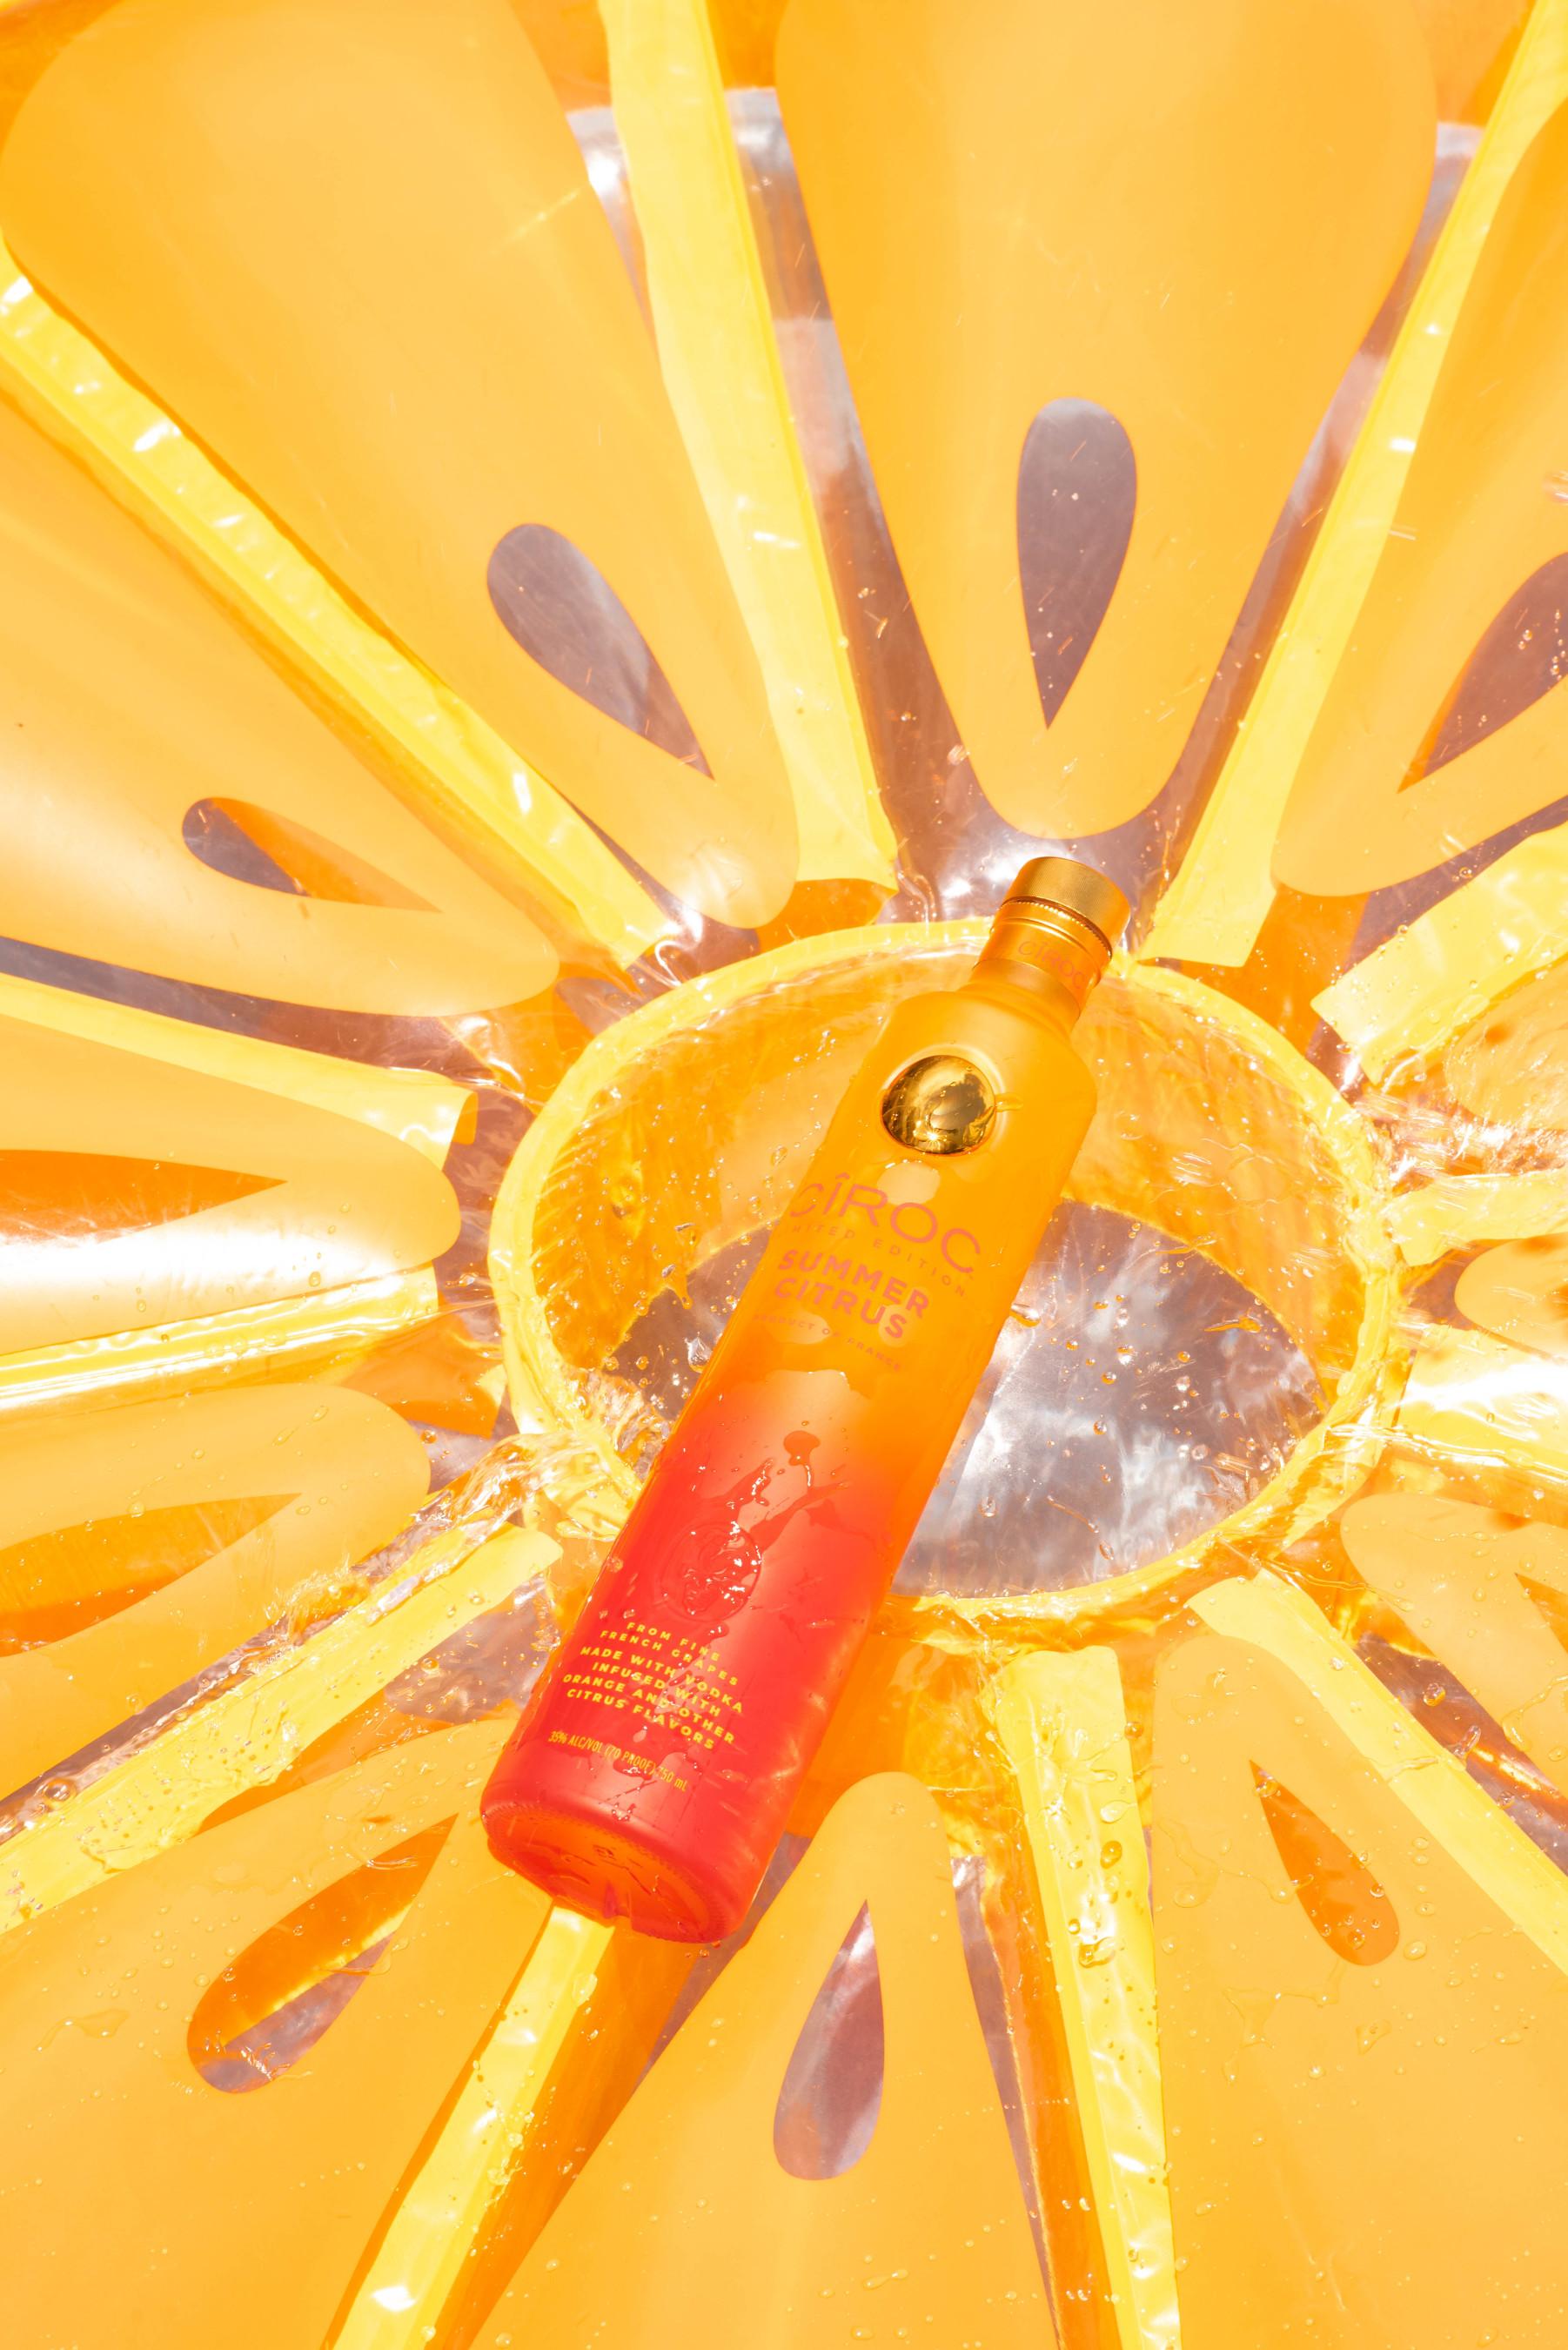 CÎROC Summer Citrus, the New Flavor of Summer